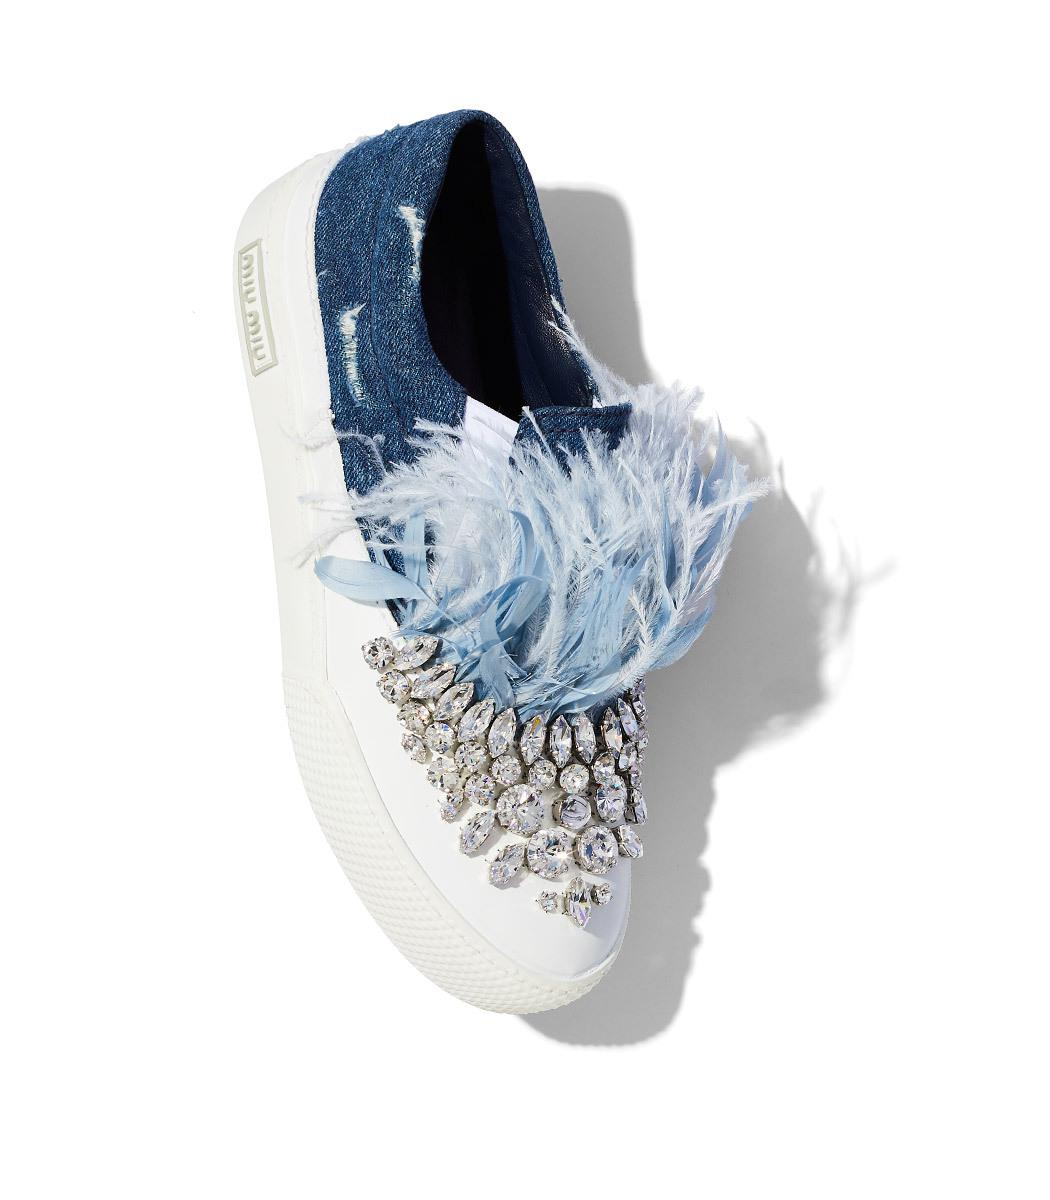 Miu Miu White & Blue Feather Crystal Slip-On Sneakers b9T4ENb10d